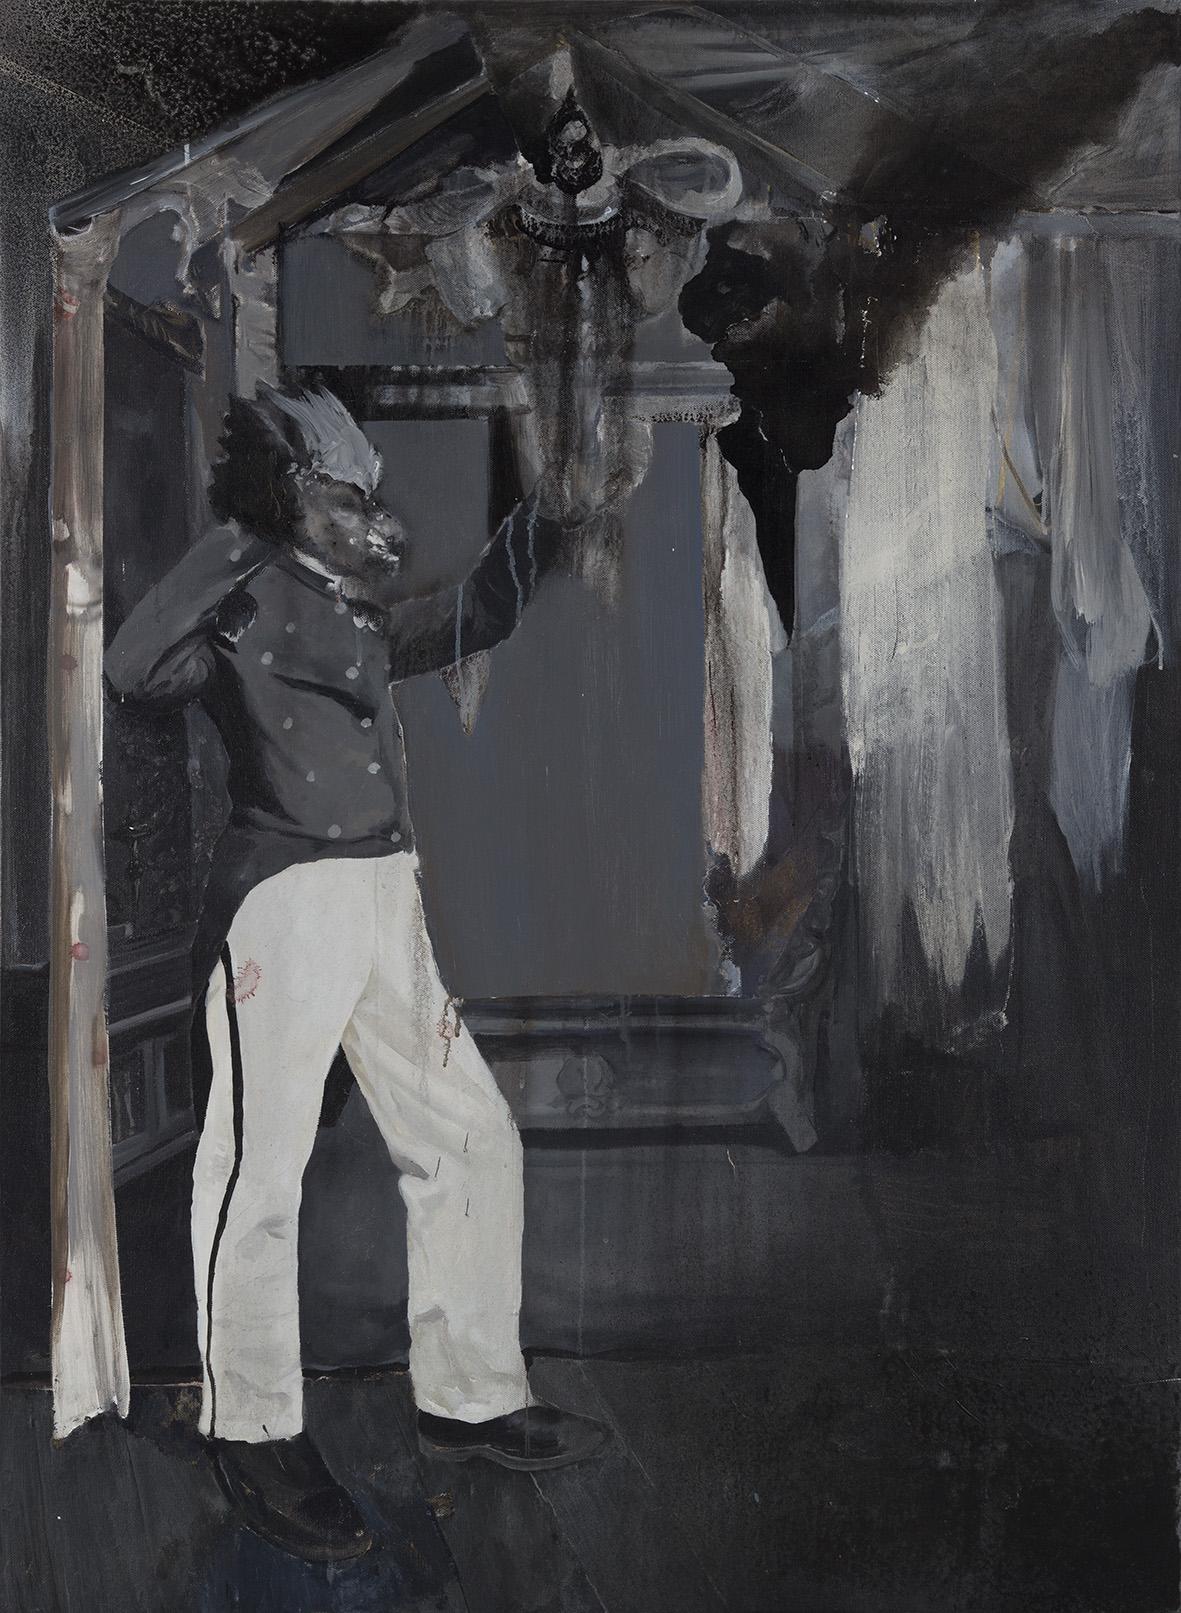 Chen Yujun 陈彧君, Ceremoney NO.1 仪式No.1, 2010, Acrylic on canvas 布面丙稀, 150 x 110 cm